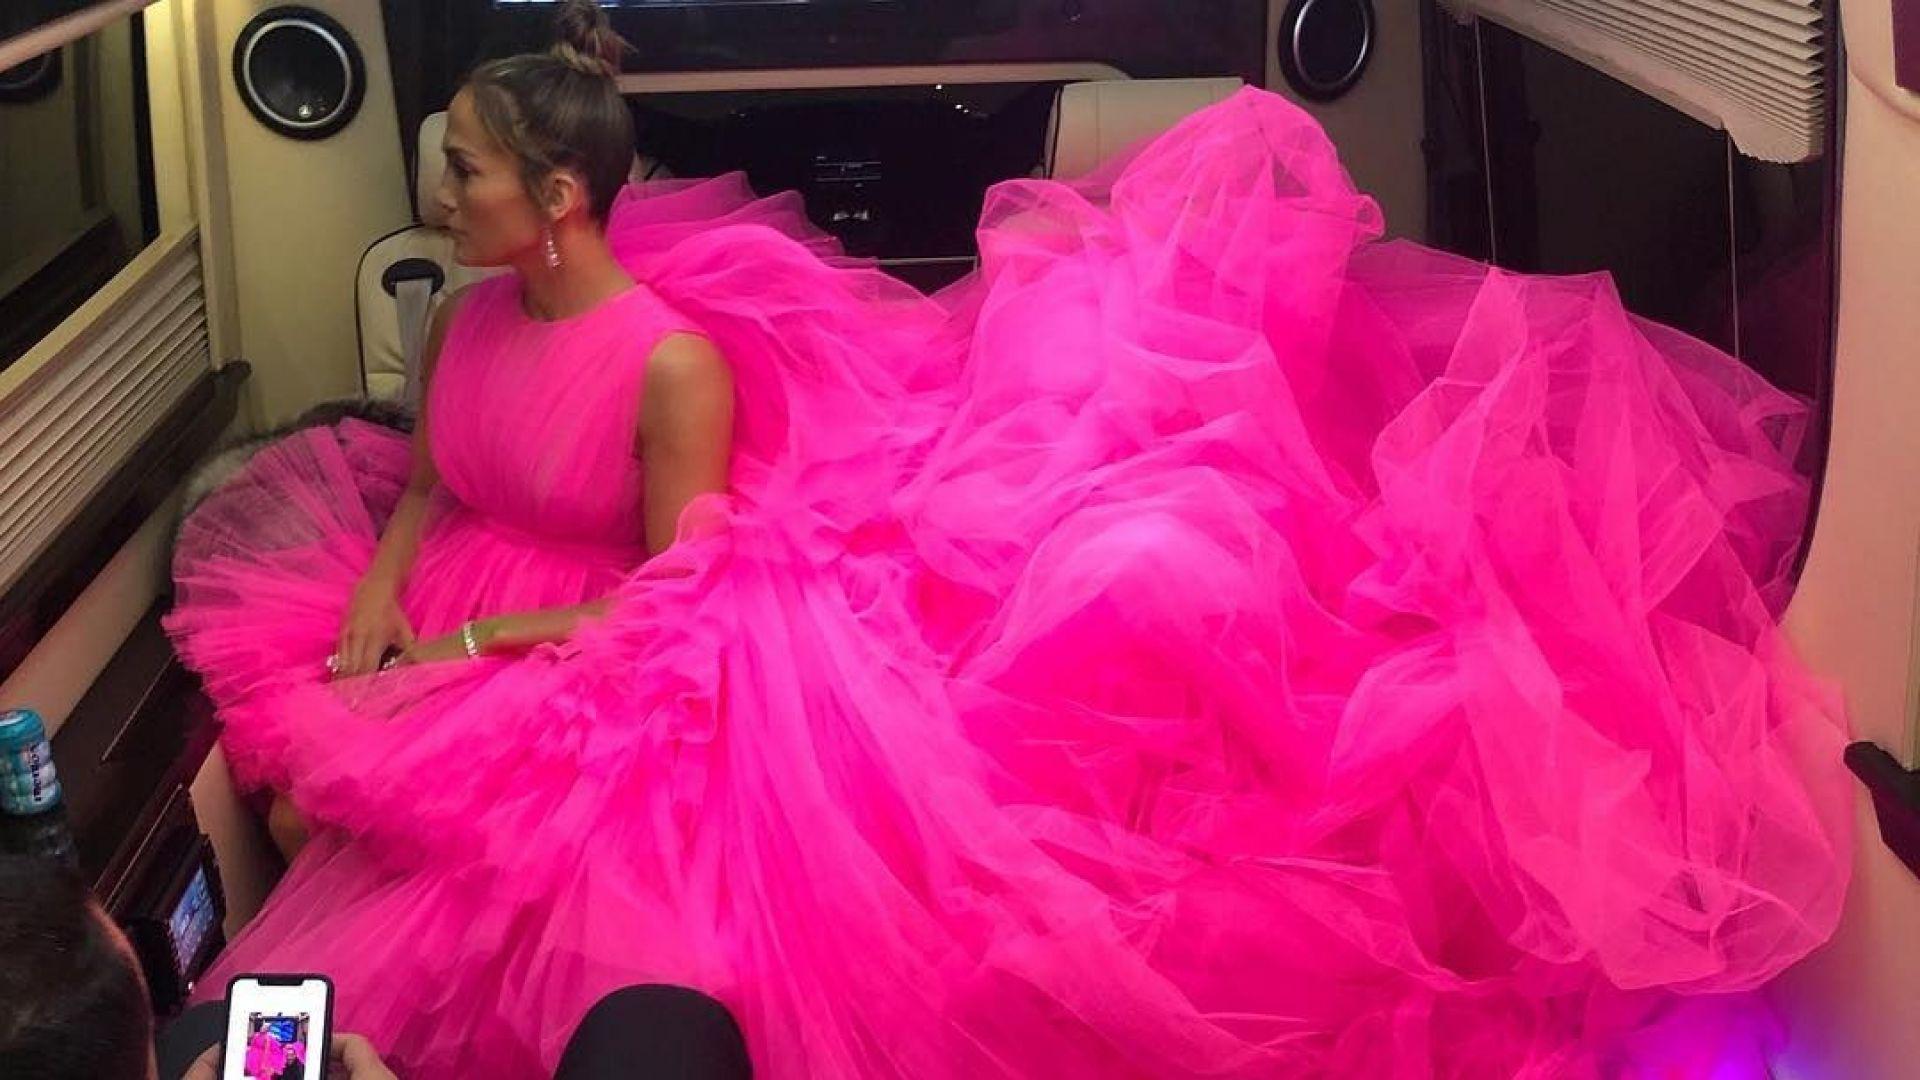 Джей Ло прикова погледите с огромна розова рокля